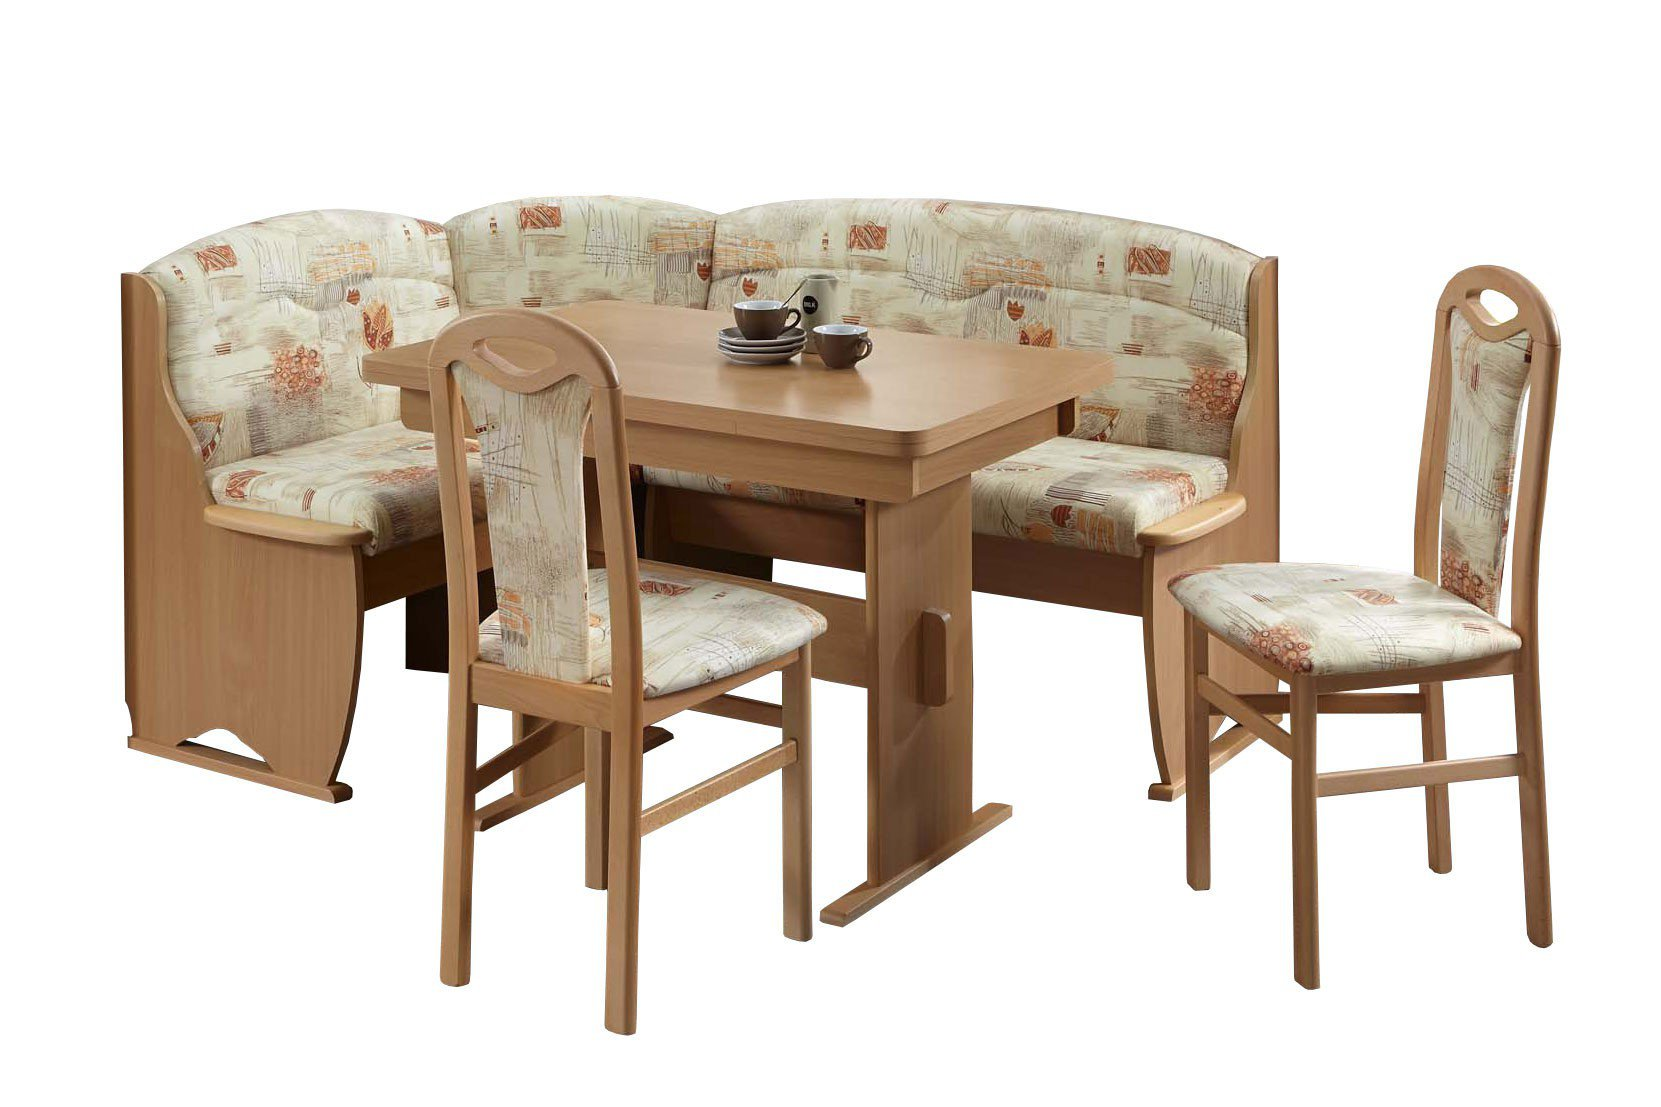 eckbankgruppe tessin von top form buche natur sandfarbig gemustert m bel letz ihr online shop. Black Bedroom Furniture Sets. Home Design Ideas